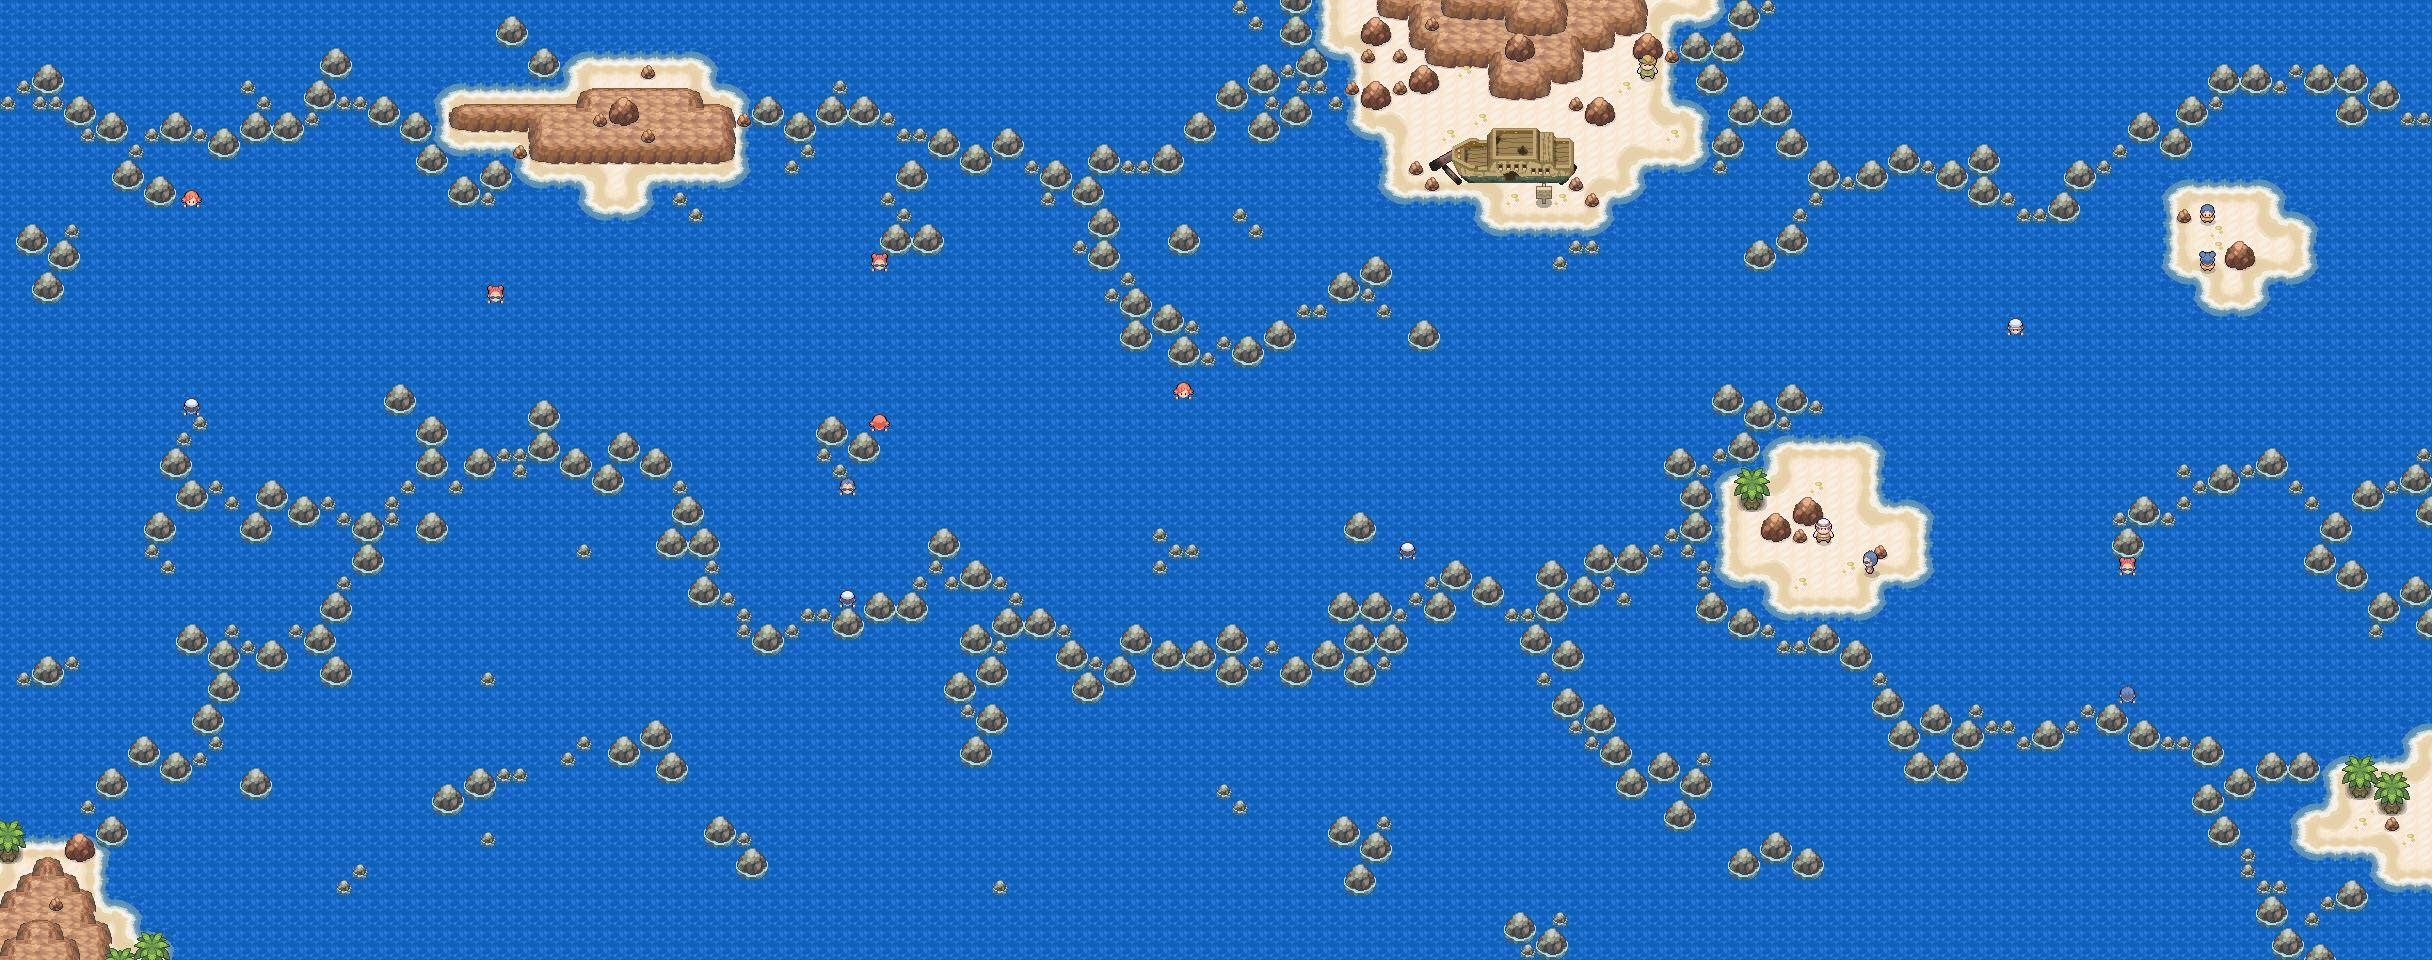 Pokémon-Map: [Hoenn] Route 107 & 108